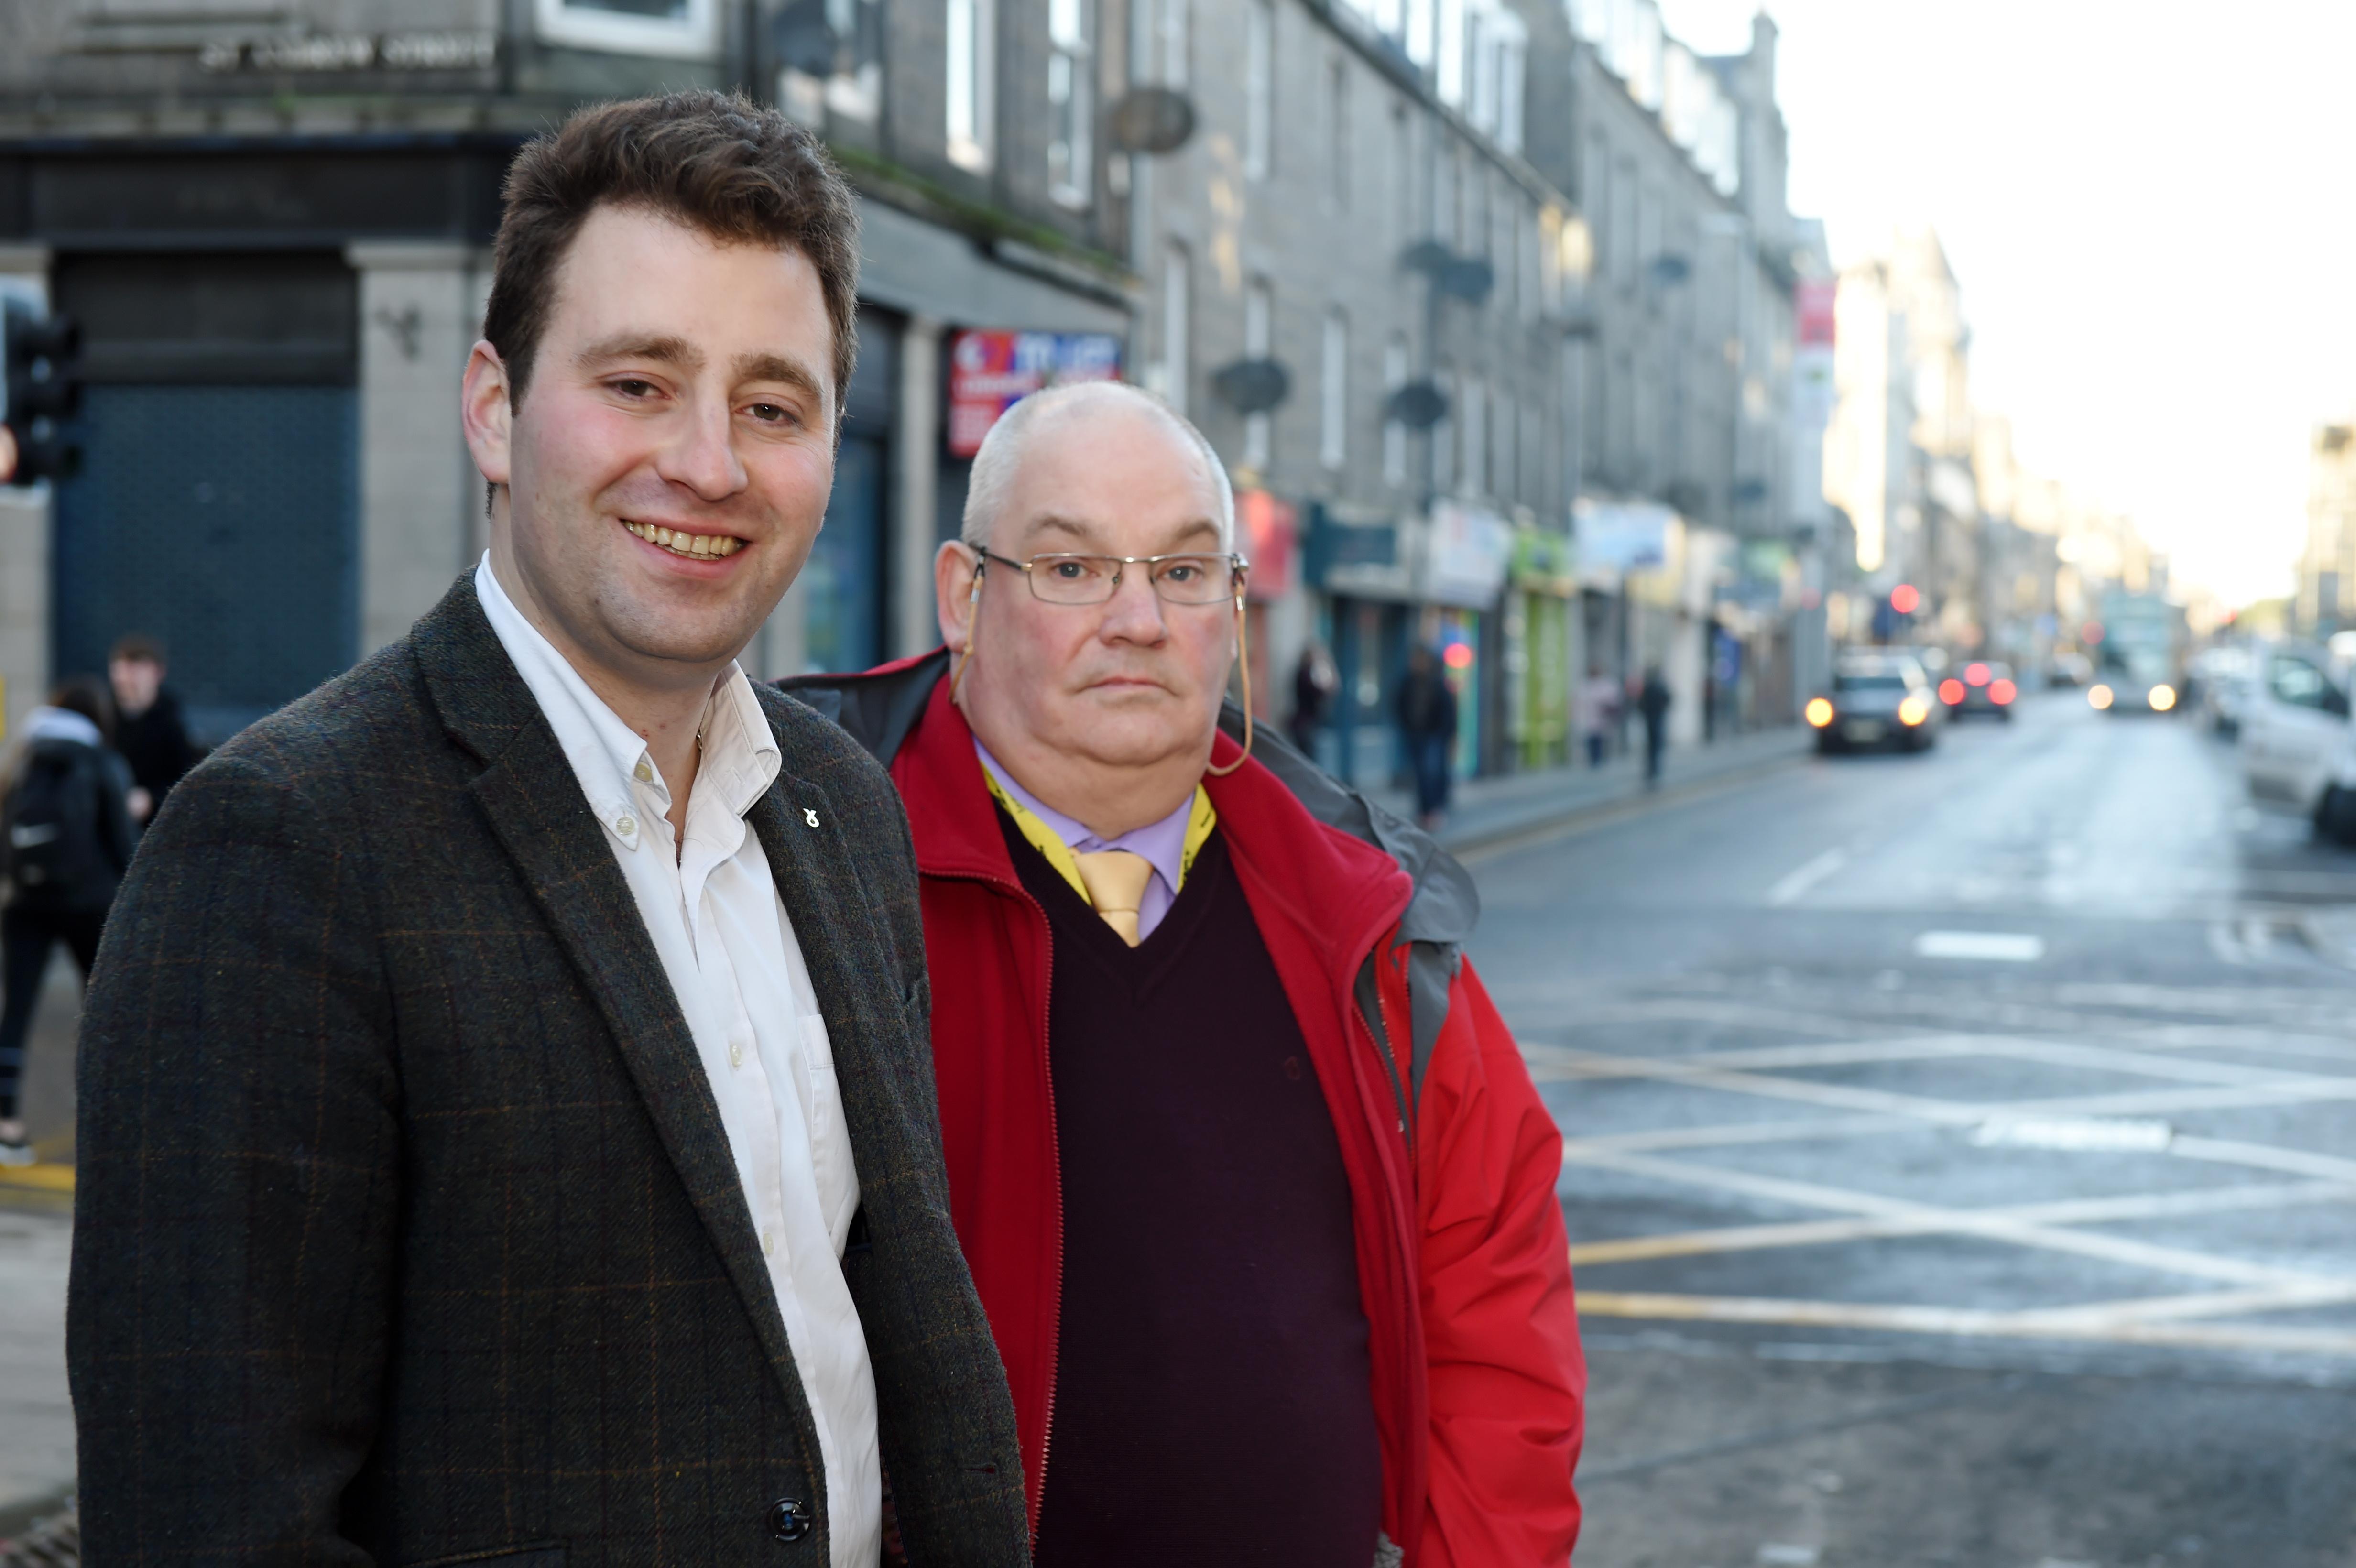 Councillors (L-R) Michael Hutchison and Dell Henrickson.